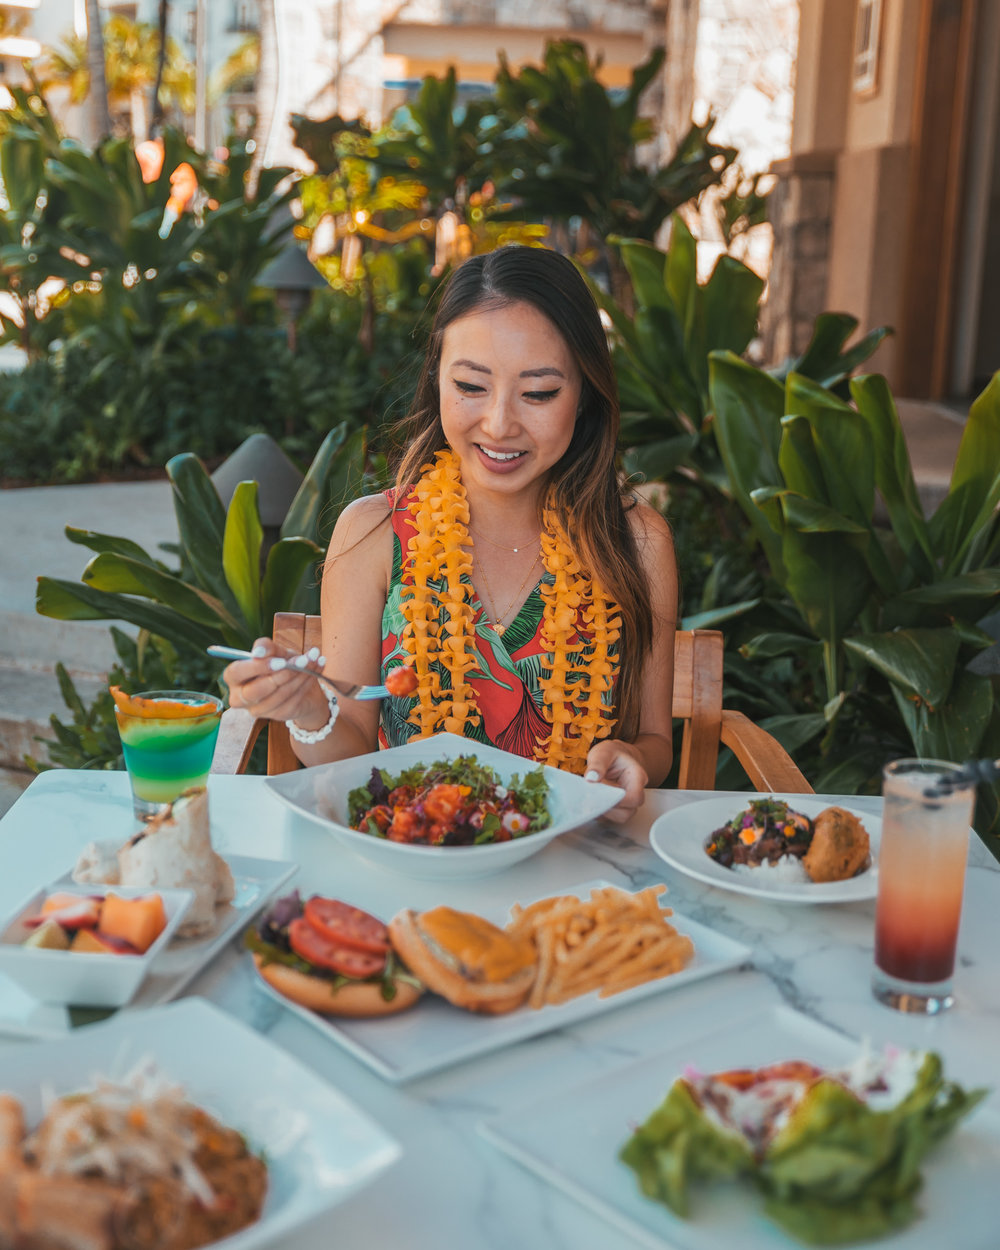 Inu Pool Bar lunch at Westin Nanea // The Quick Guide to Visiting Maui, Hawaii #readysetjetset #hawaii #maui